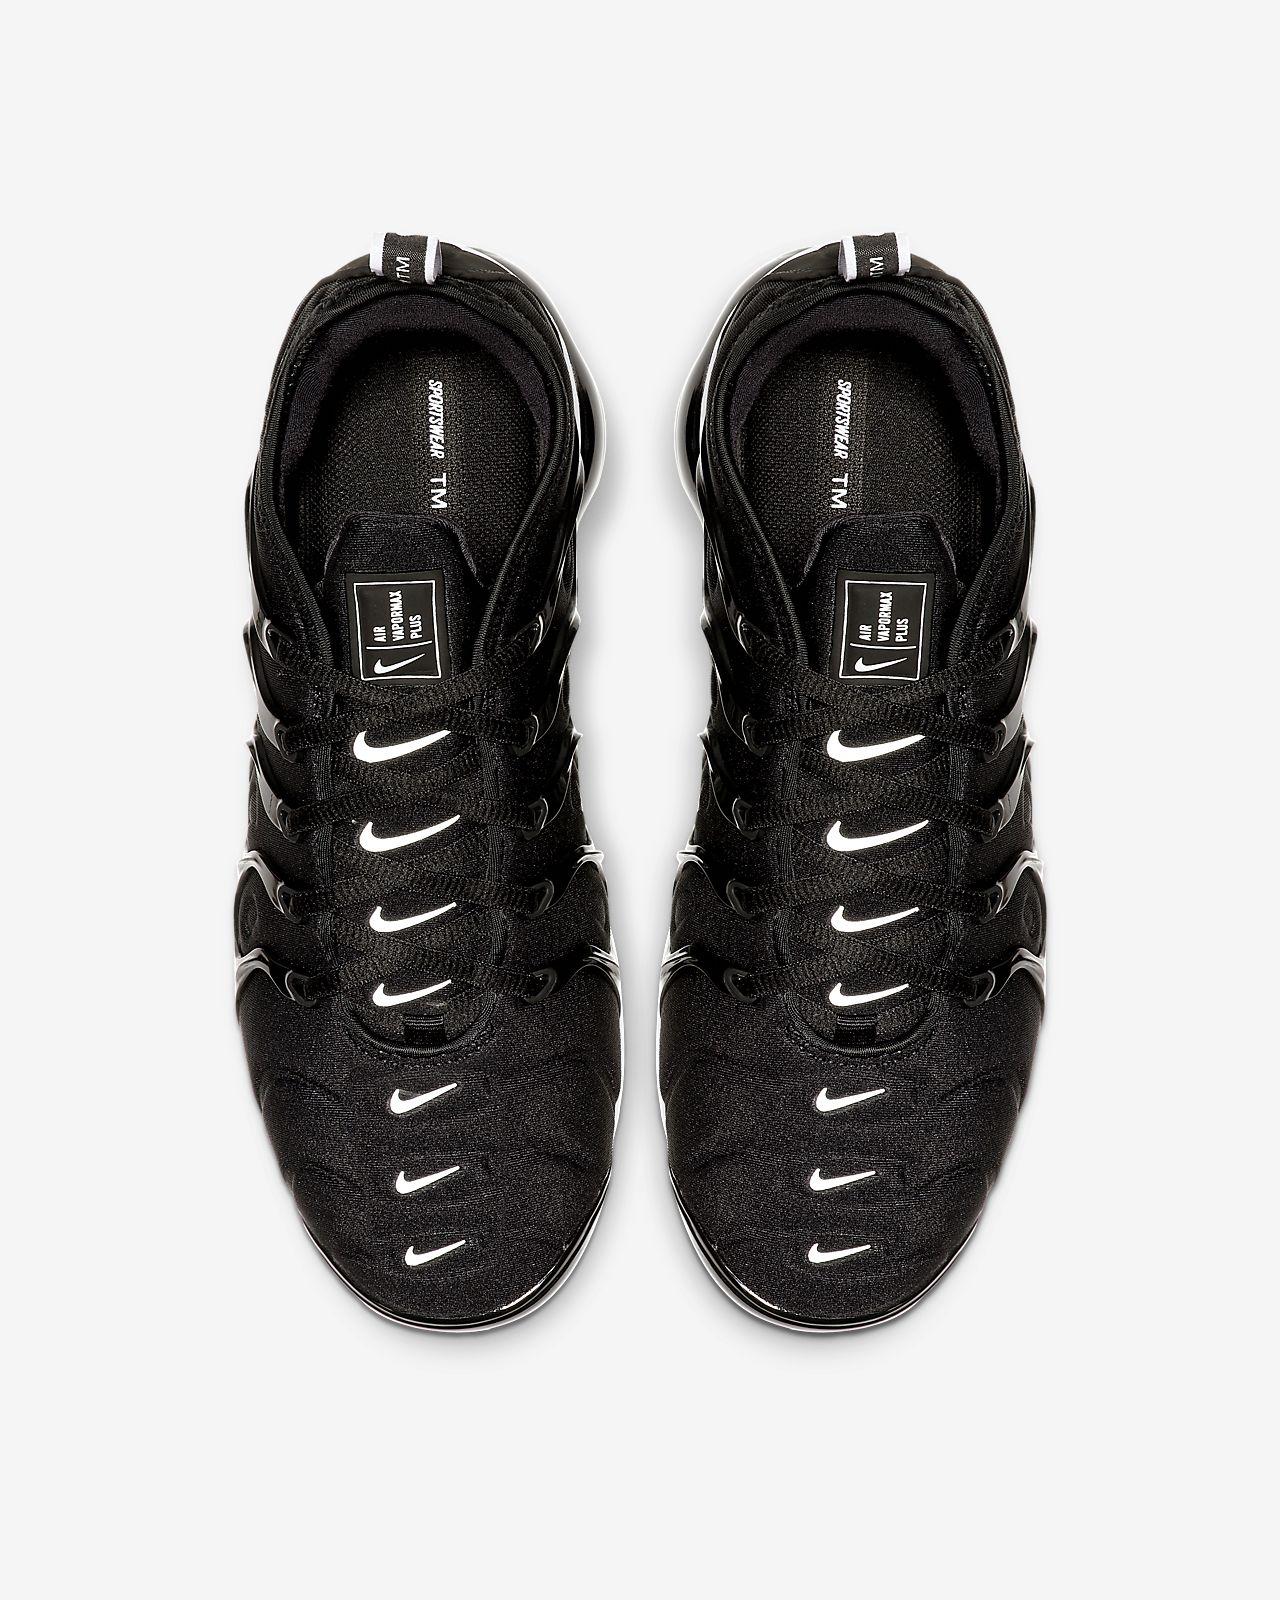 best website 06f0c ec6ae ... Nike Air VaporMax Plus Zapatillas - Hombre